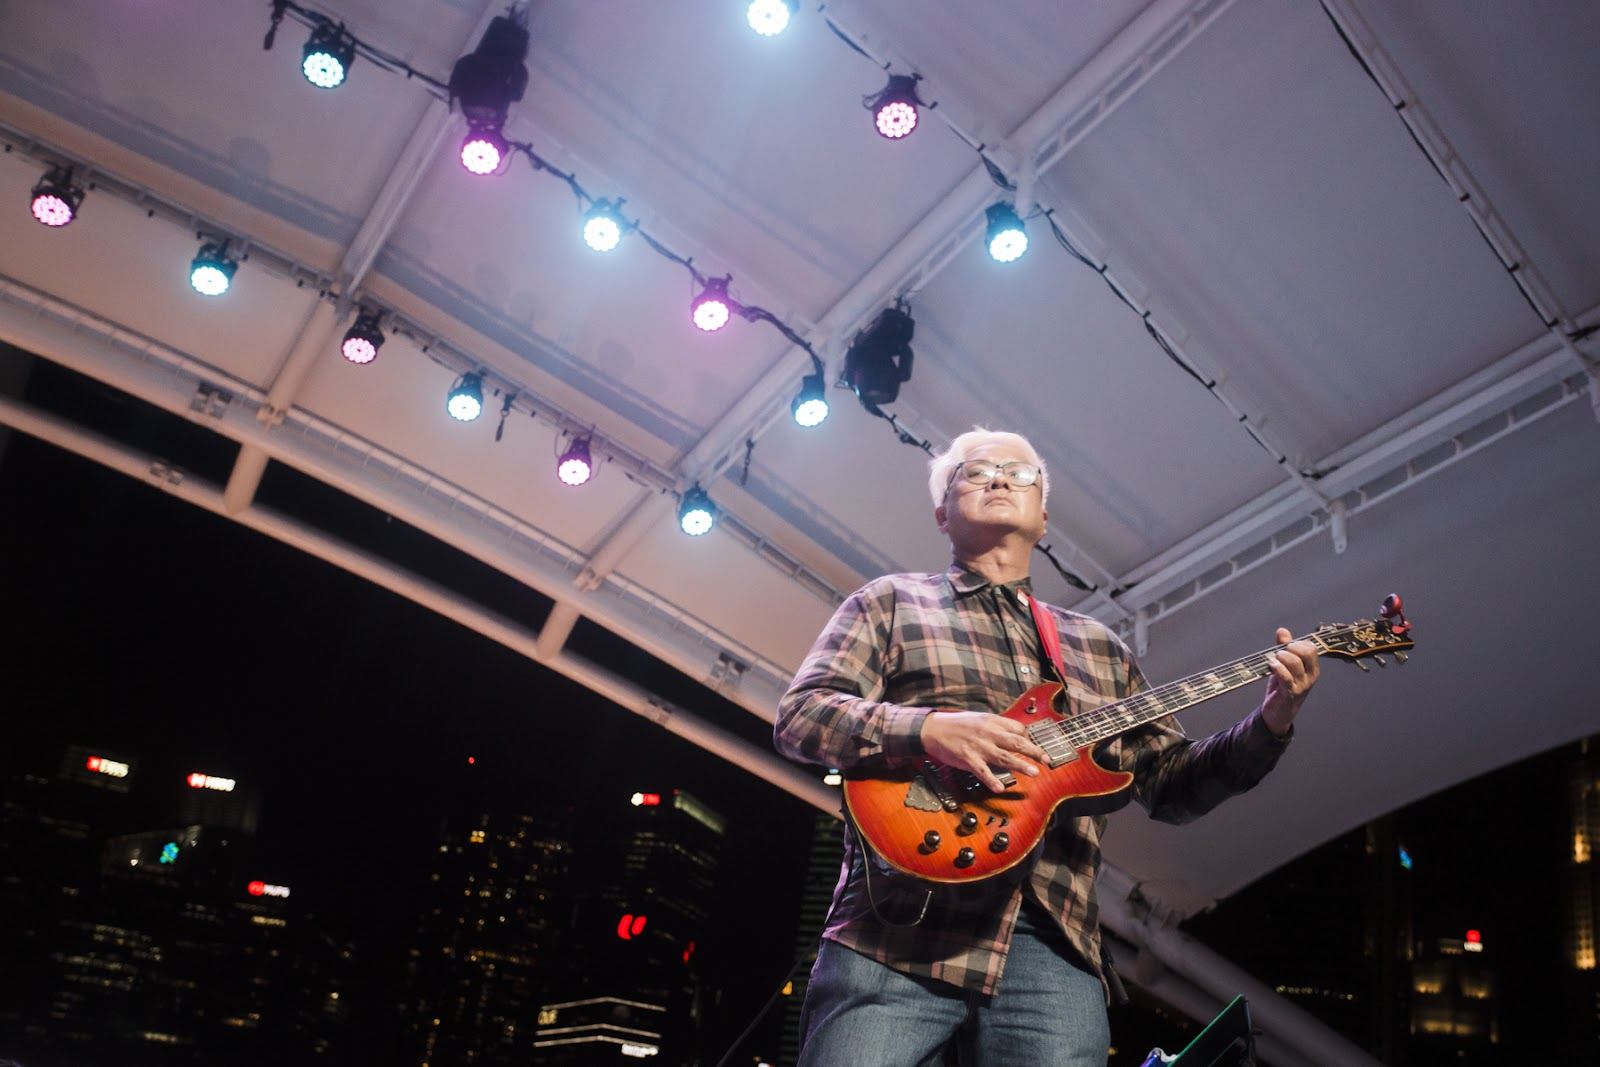 Kelvin Tan performing at Esplanade with the Oddfellows